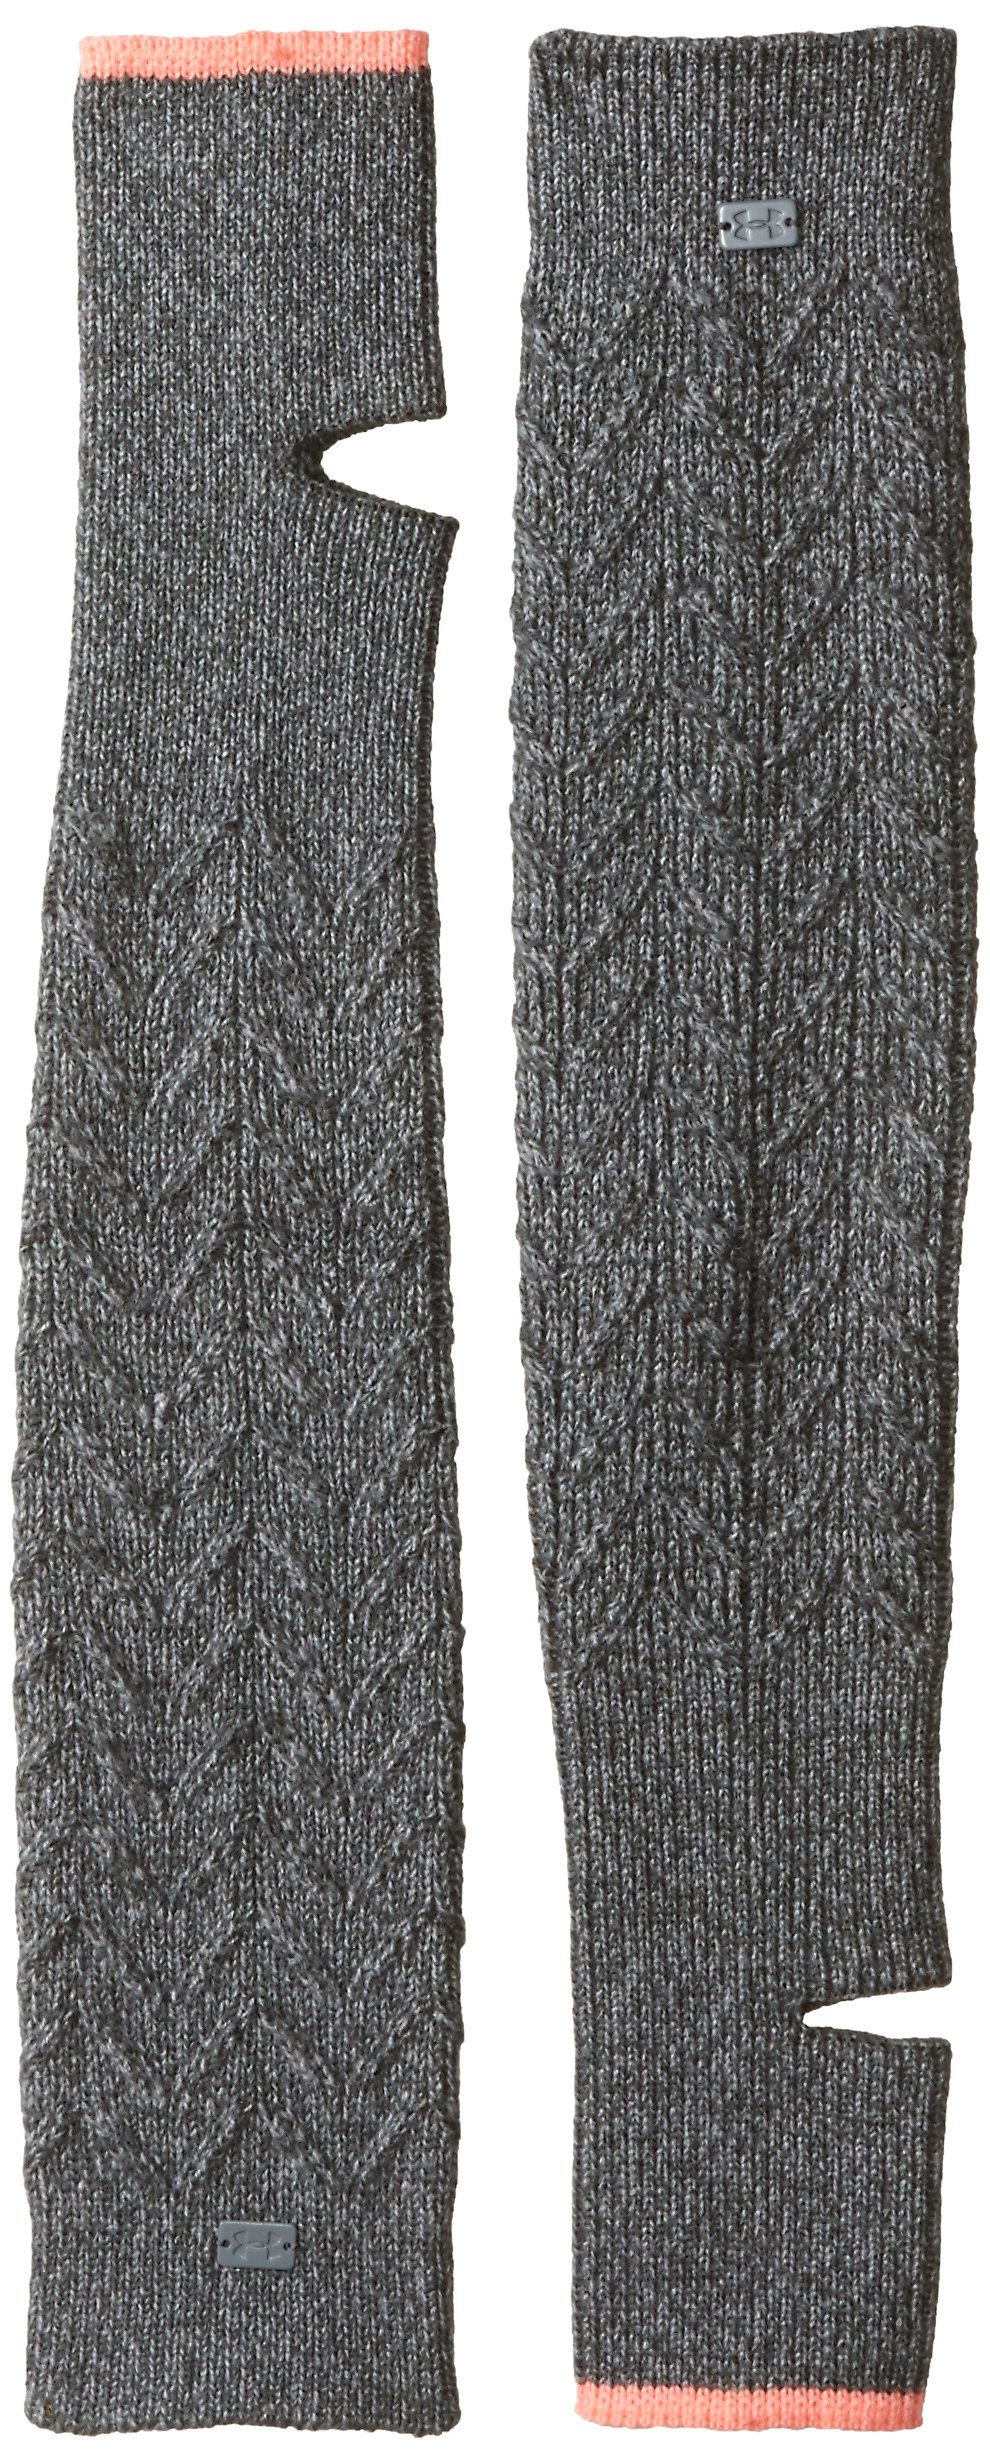 Under Armour Women's Around Town Leg Warmers, Rhino Gray (076)/Steel, One Size